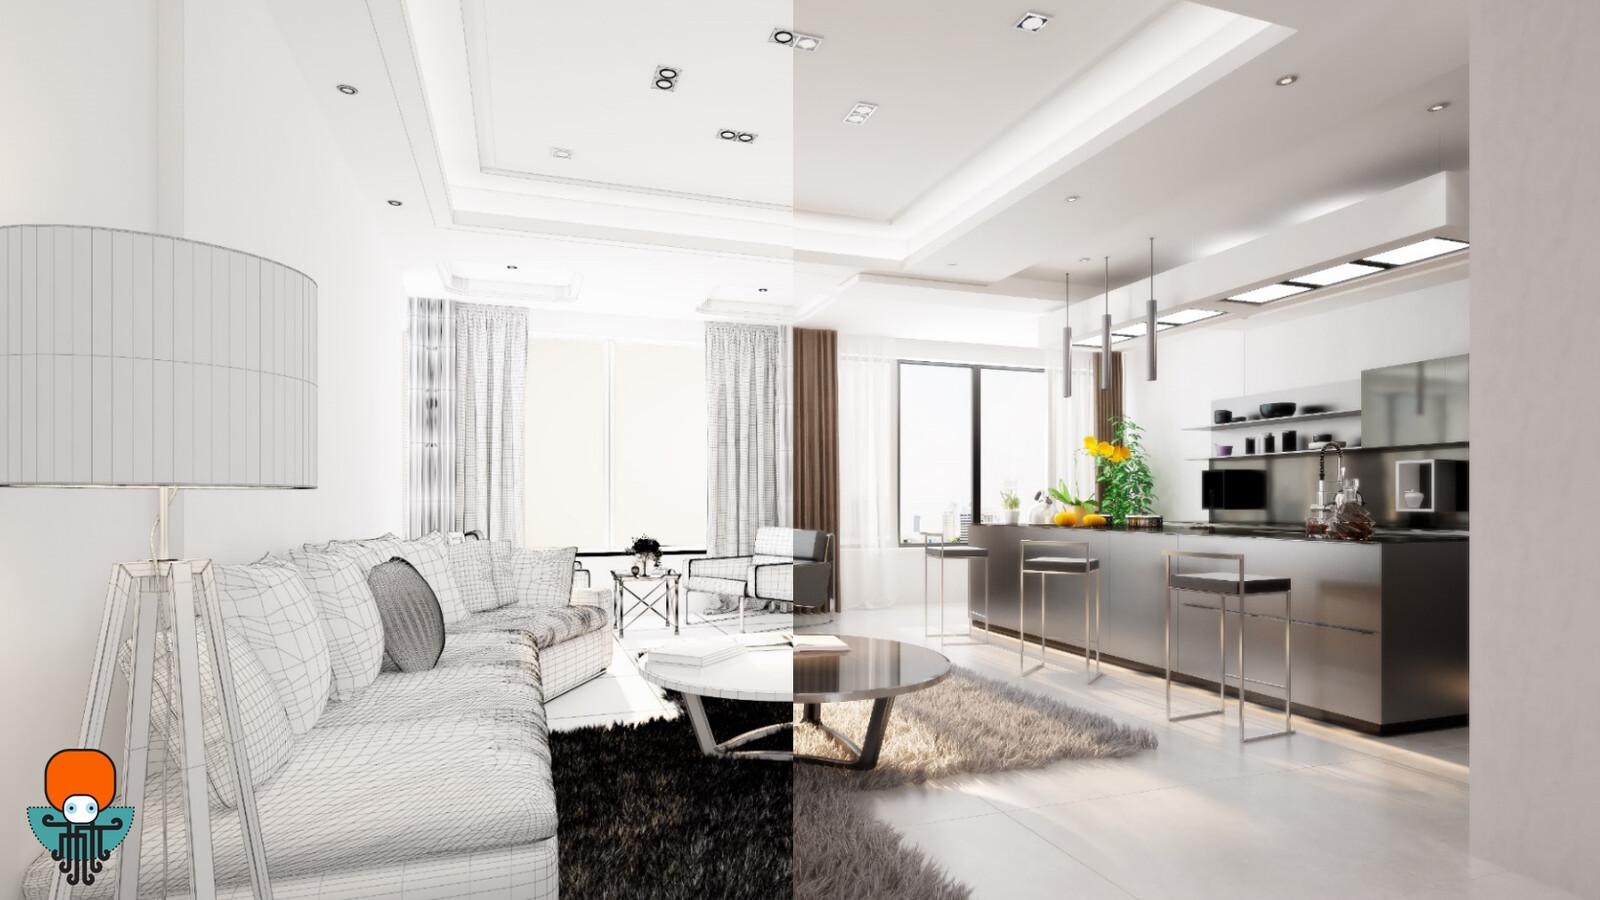 Two parts, interior design process